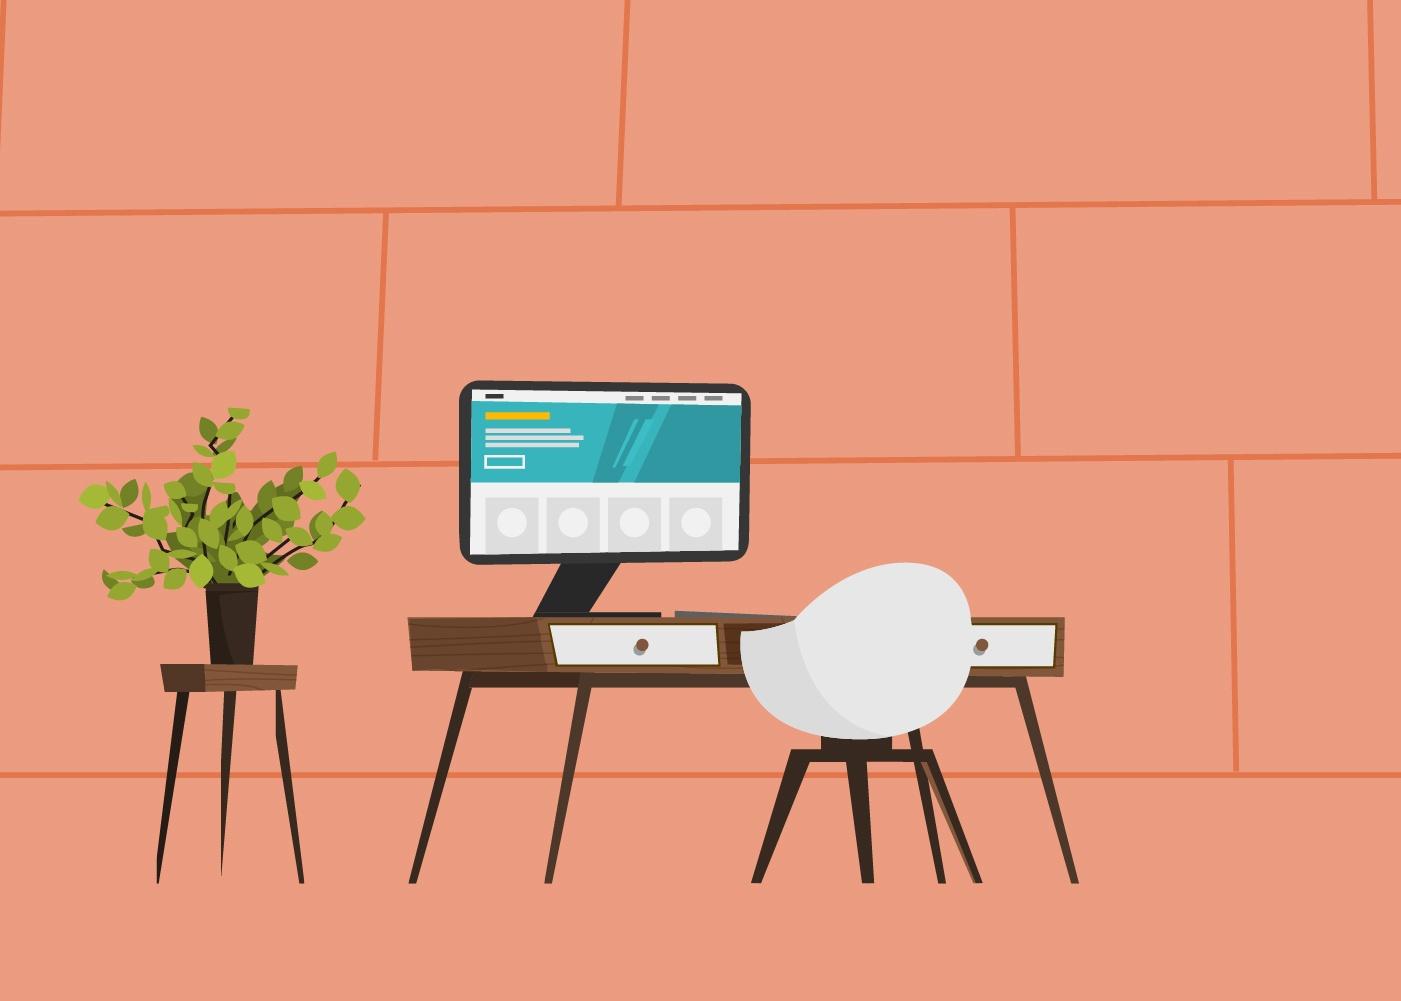 http://uat.direction.group/assets/images/work/MS_teamwork_infographic_%281%29.jpg